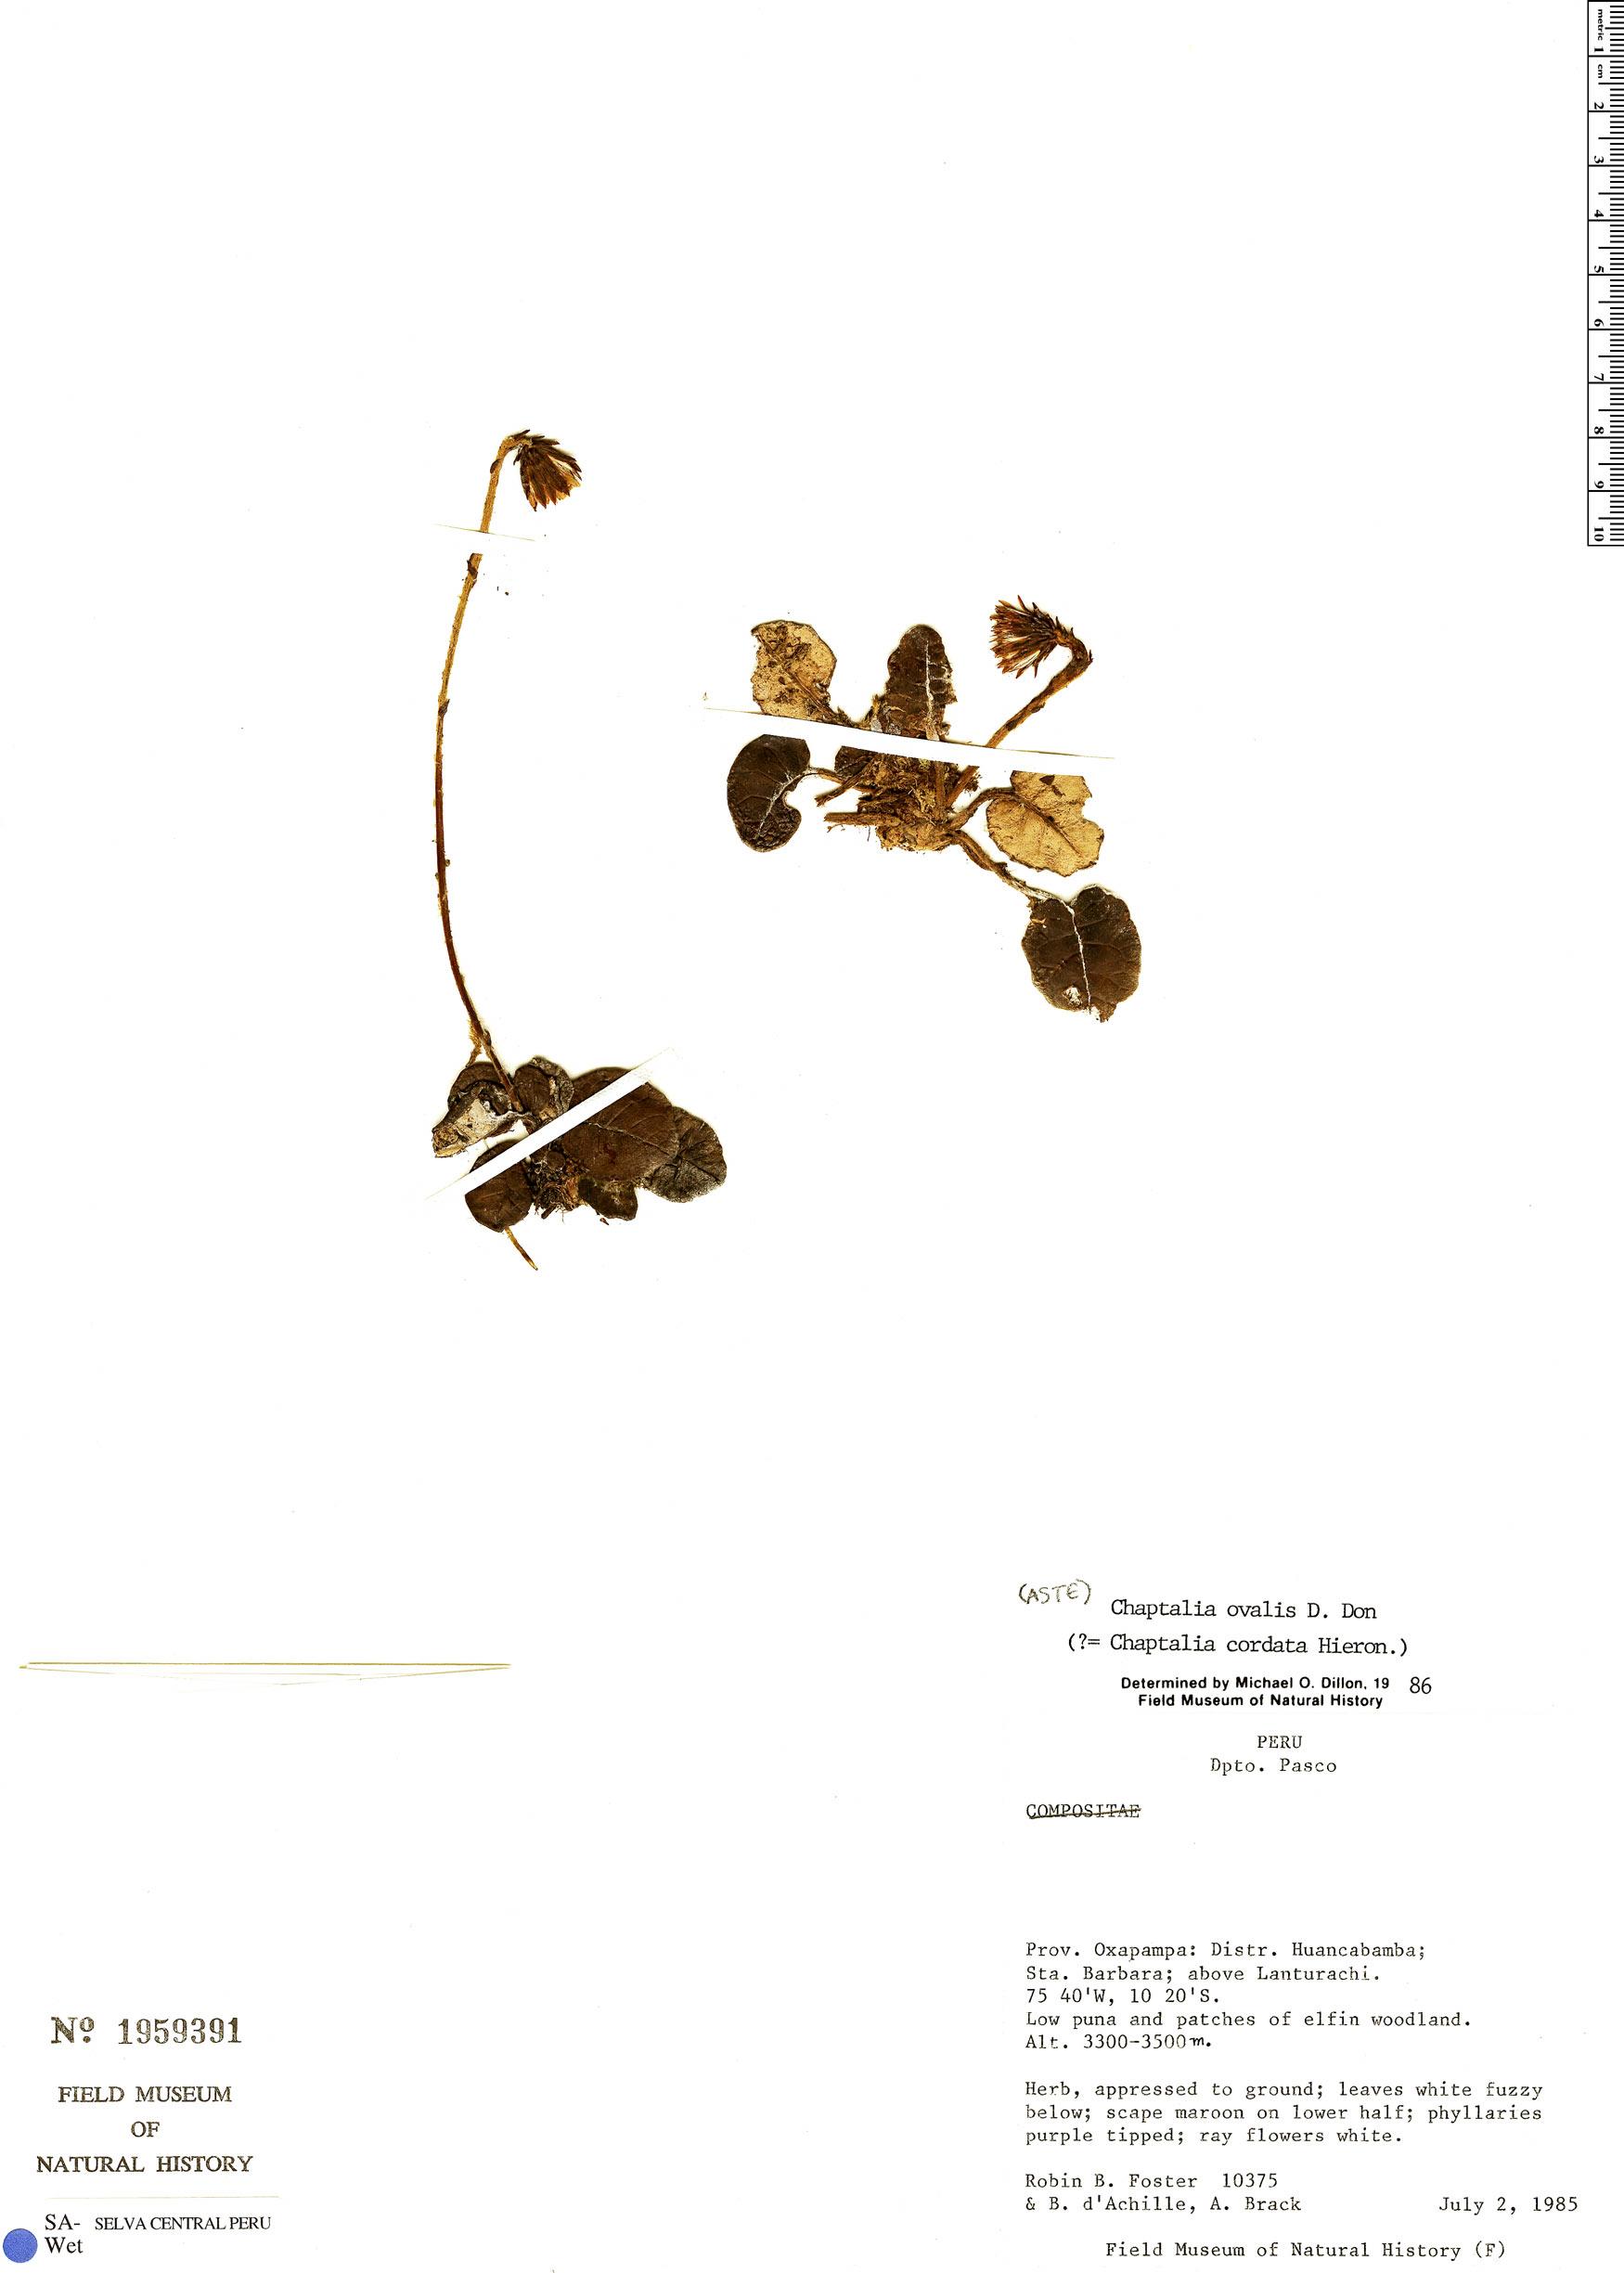 Specimen: Chaptalia ovalis